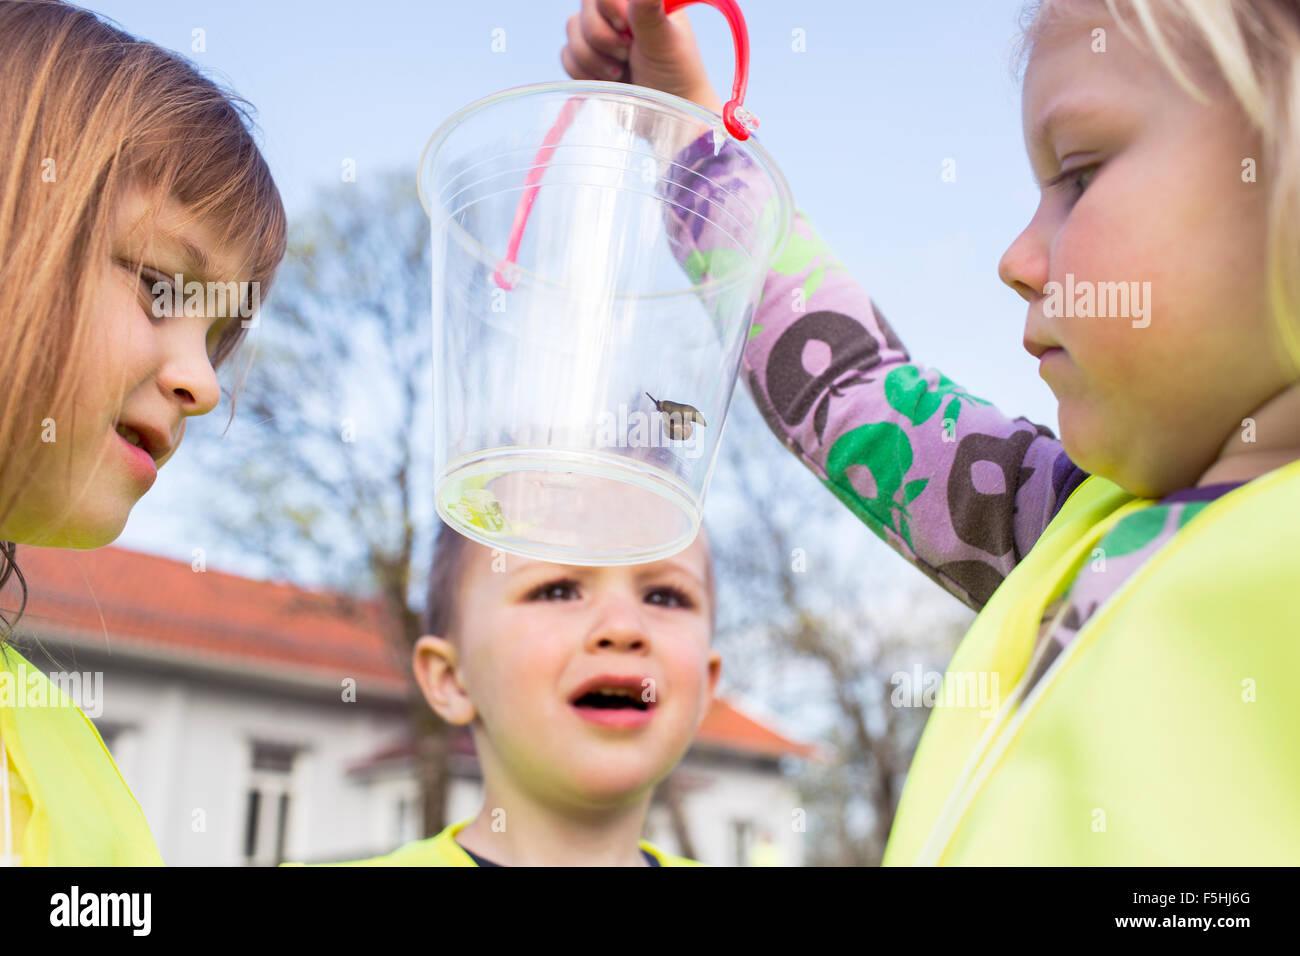 Suecia, Vastergotland, Olofstorp, Bergum, niños de kinder (2-3, 4-5) El aprendizaje al aire libre Foto de stock